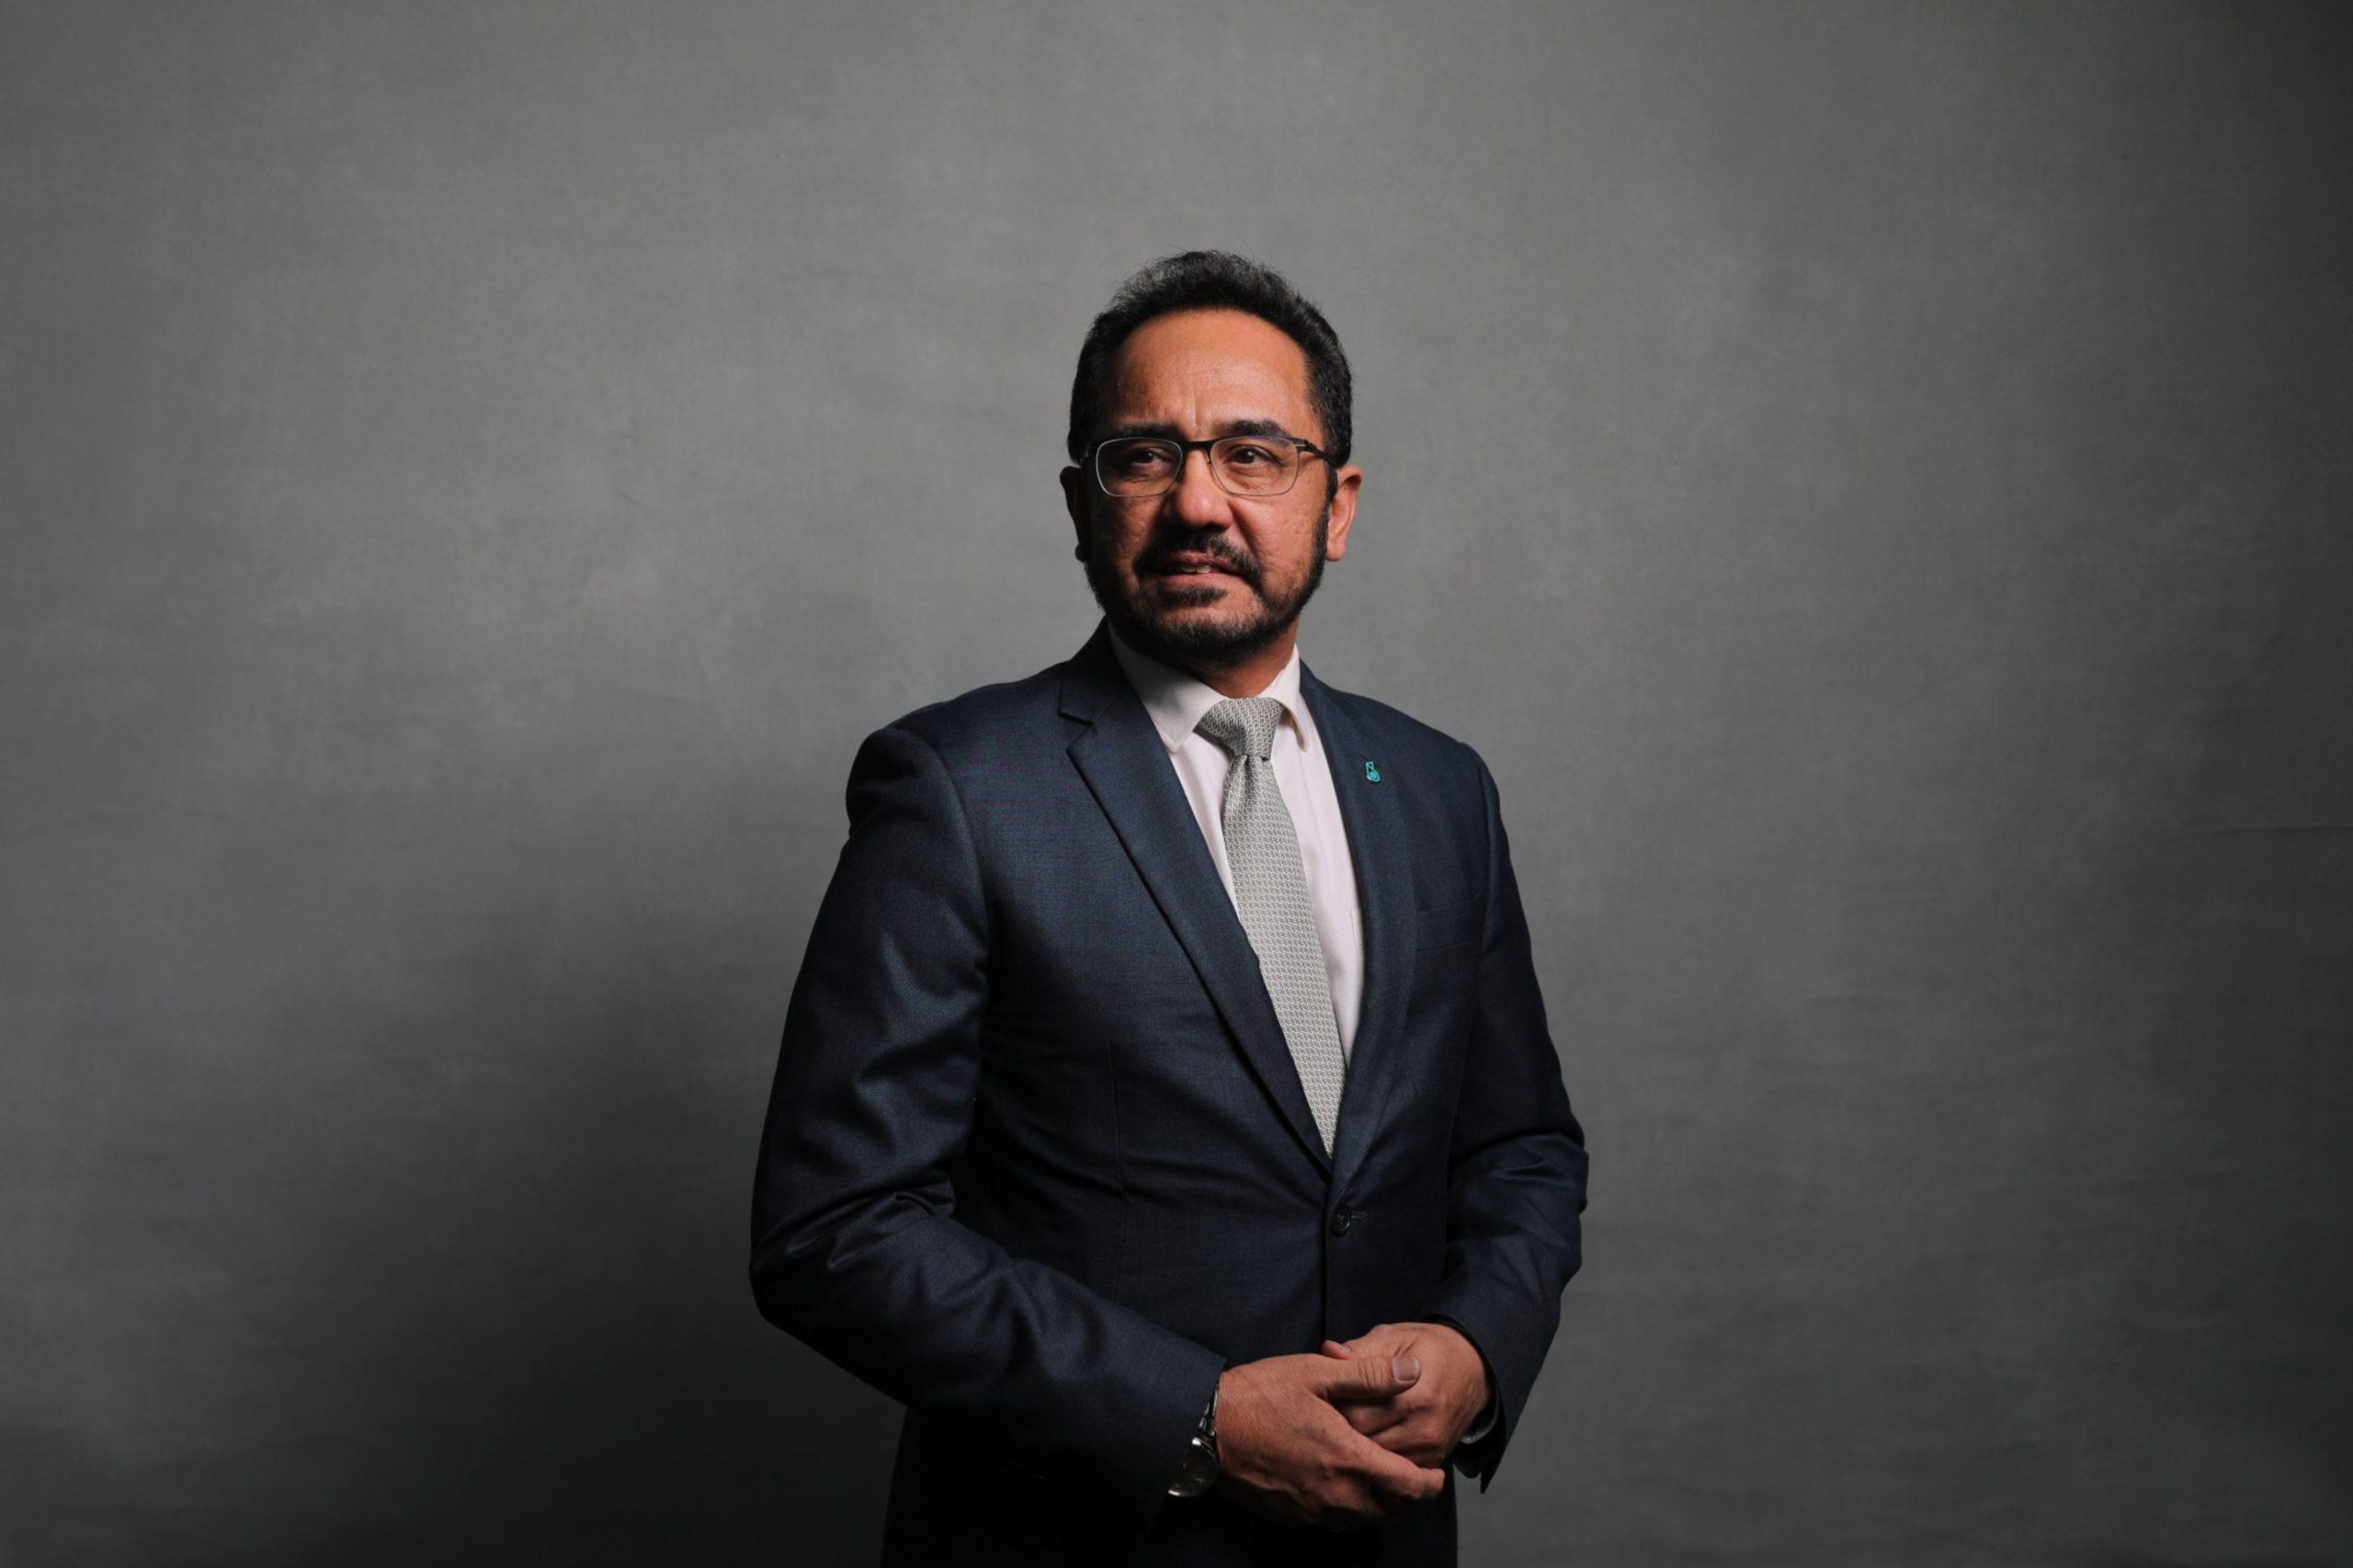 Former head of Petronas and ExxonMobil board member: Wan Zulkiflee Wan Ariffin